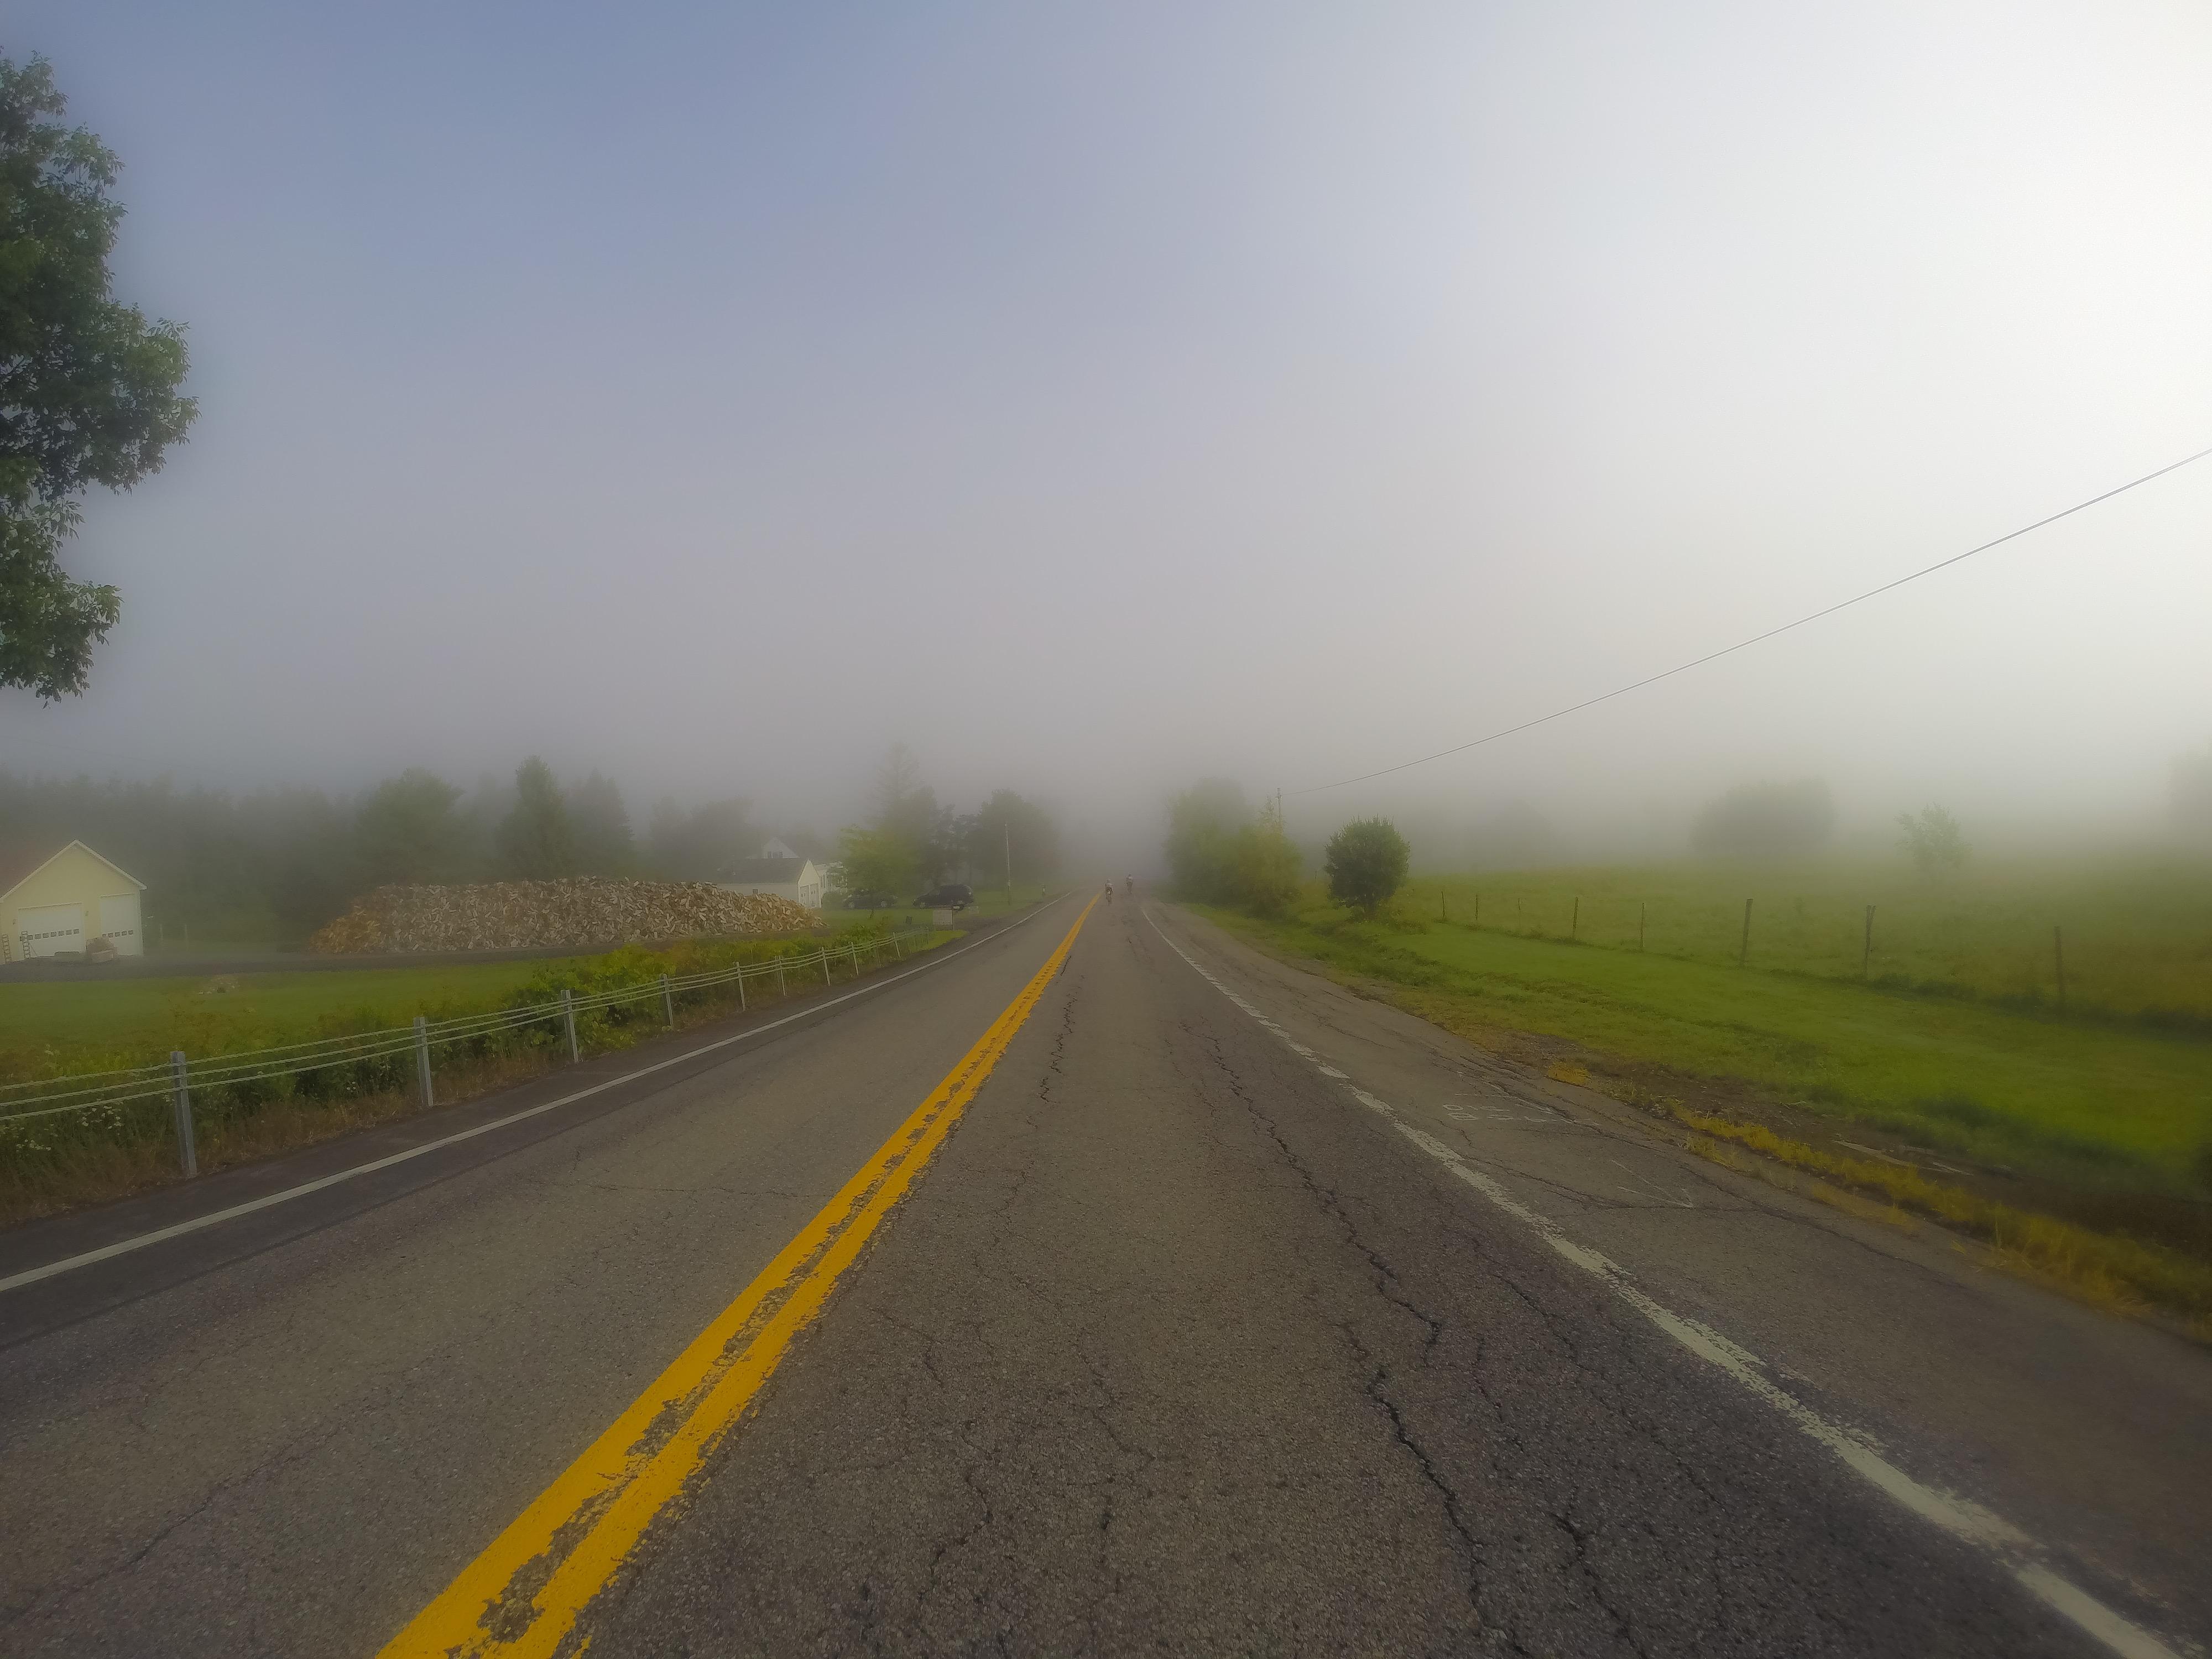 Riding through Stuyvesant, N.Y. as the sun burns off the morning fog.